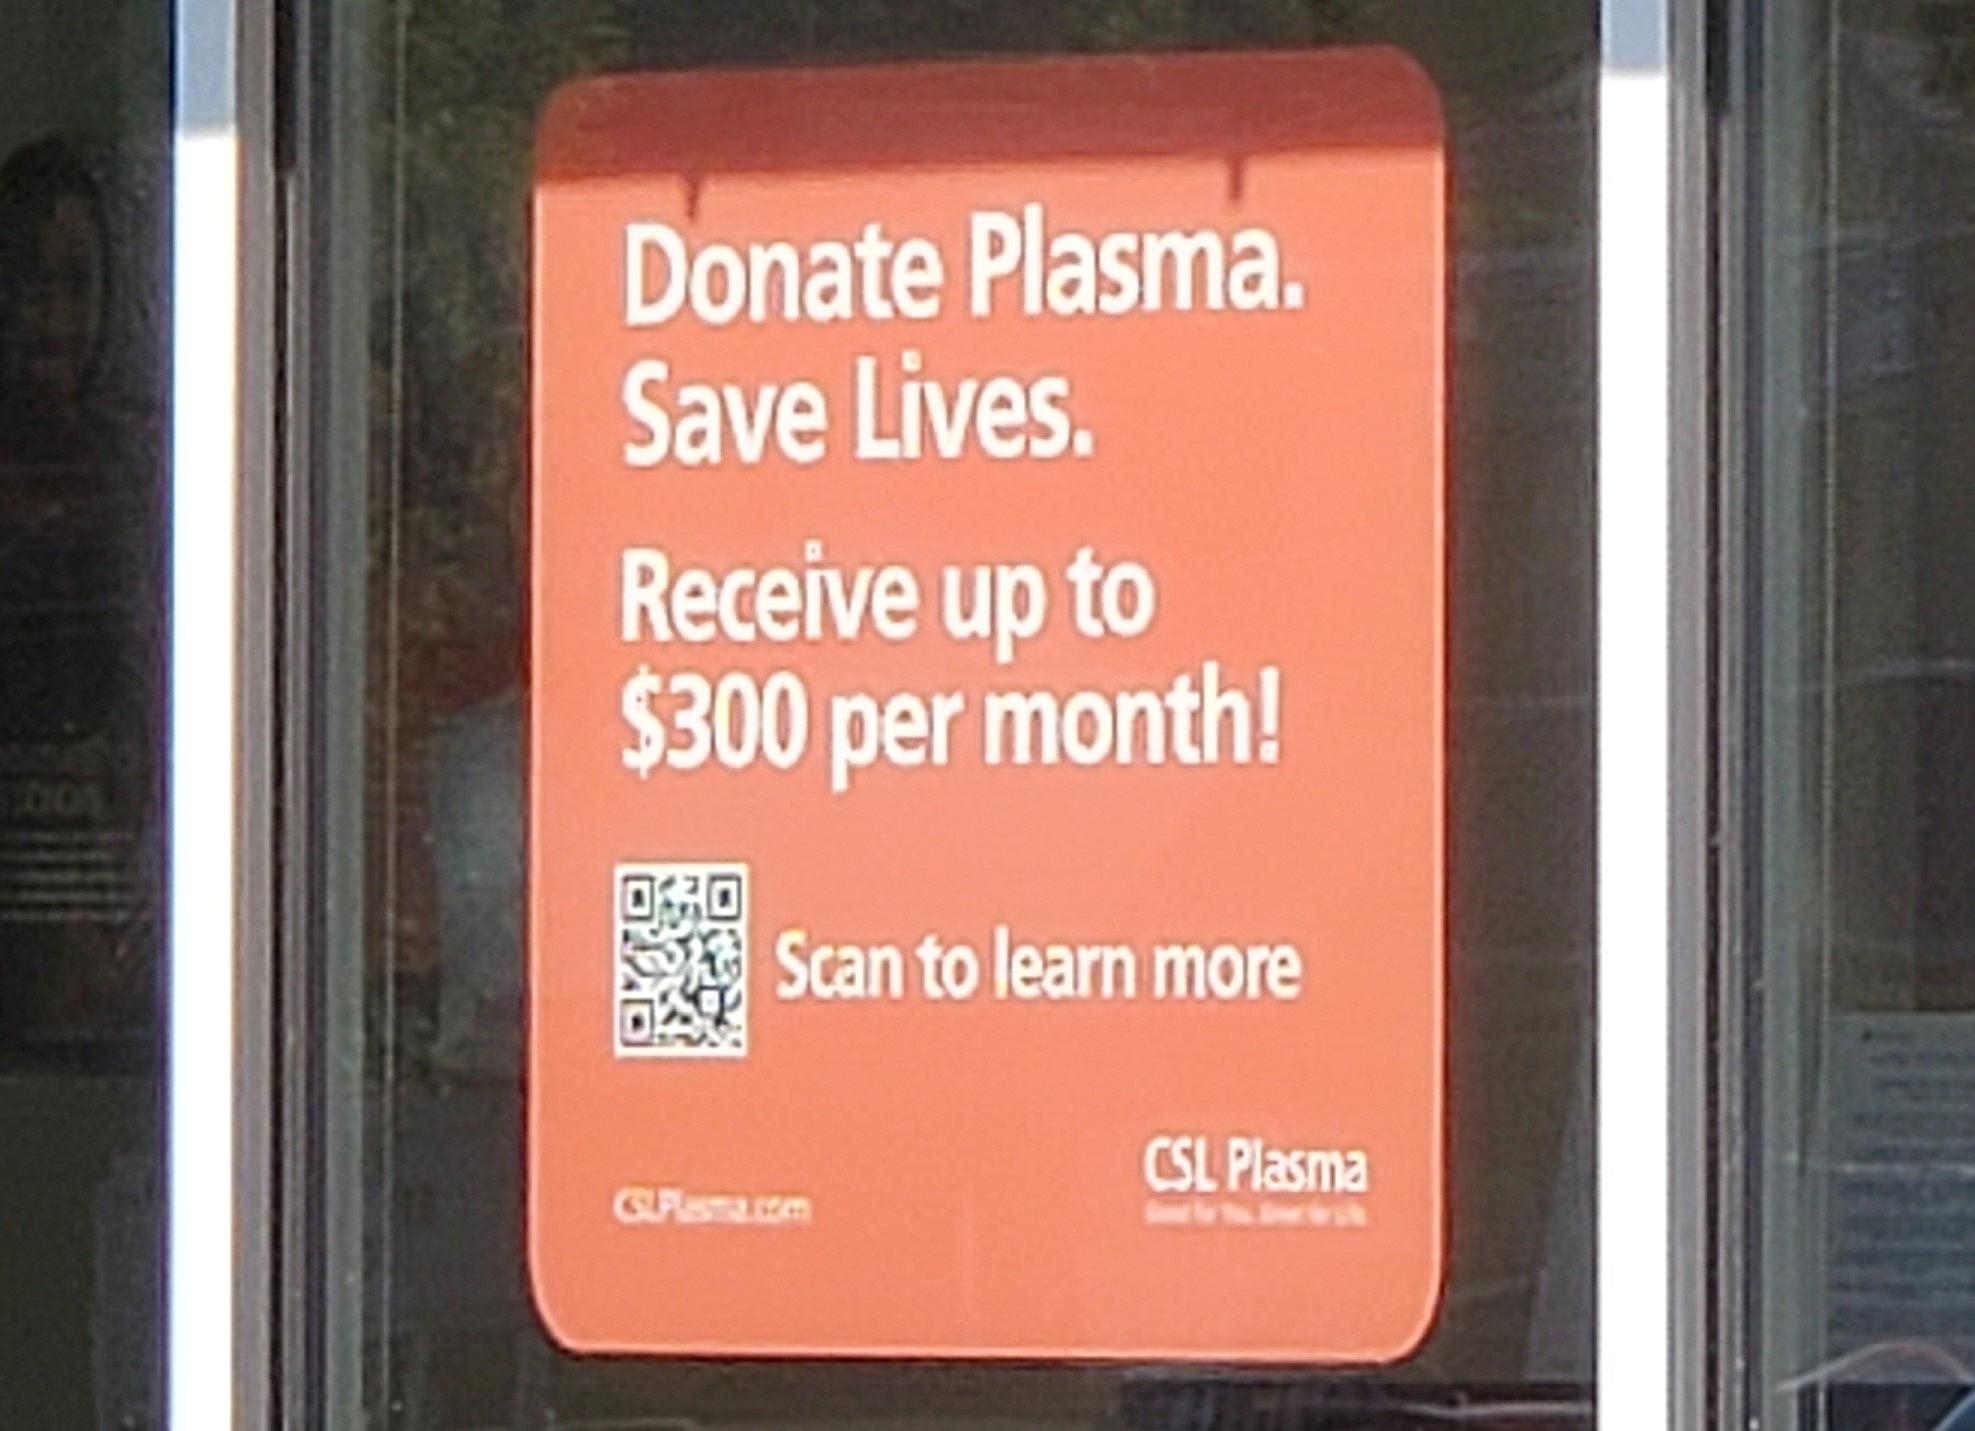 Endwell Blood Plasma Center Preparing to Open